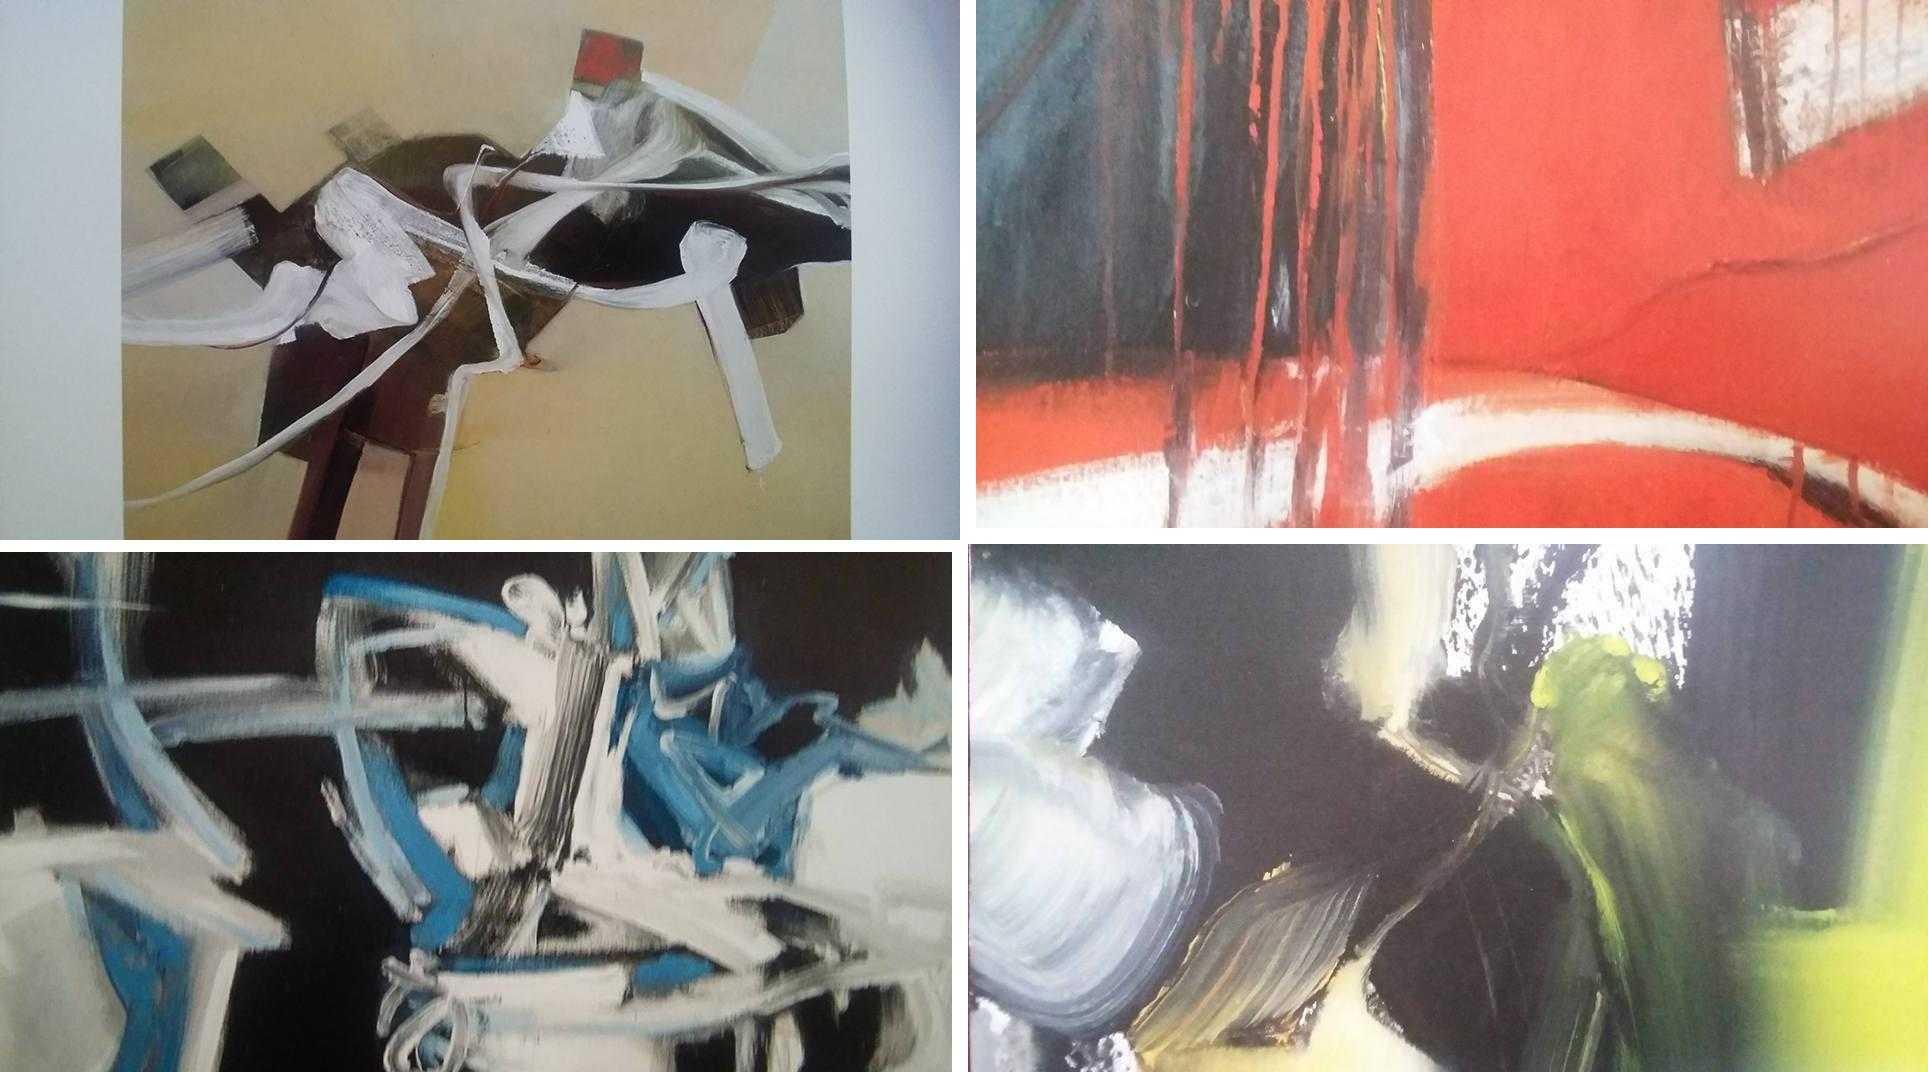 83+ Gambar Abstrak Non Figuratif Paling Keren